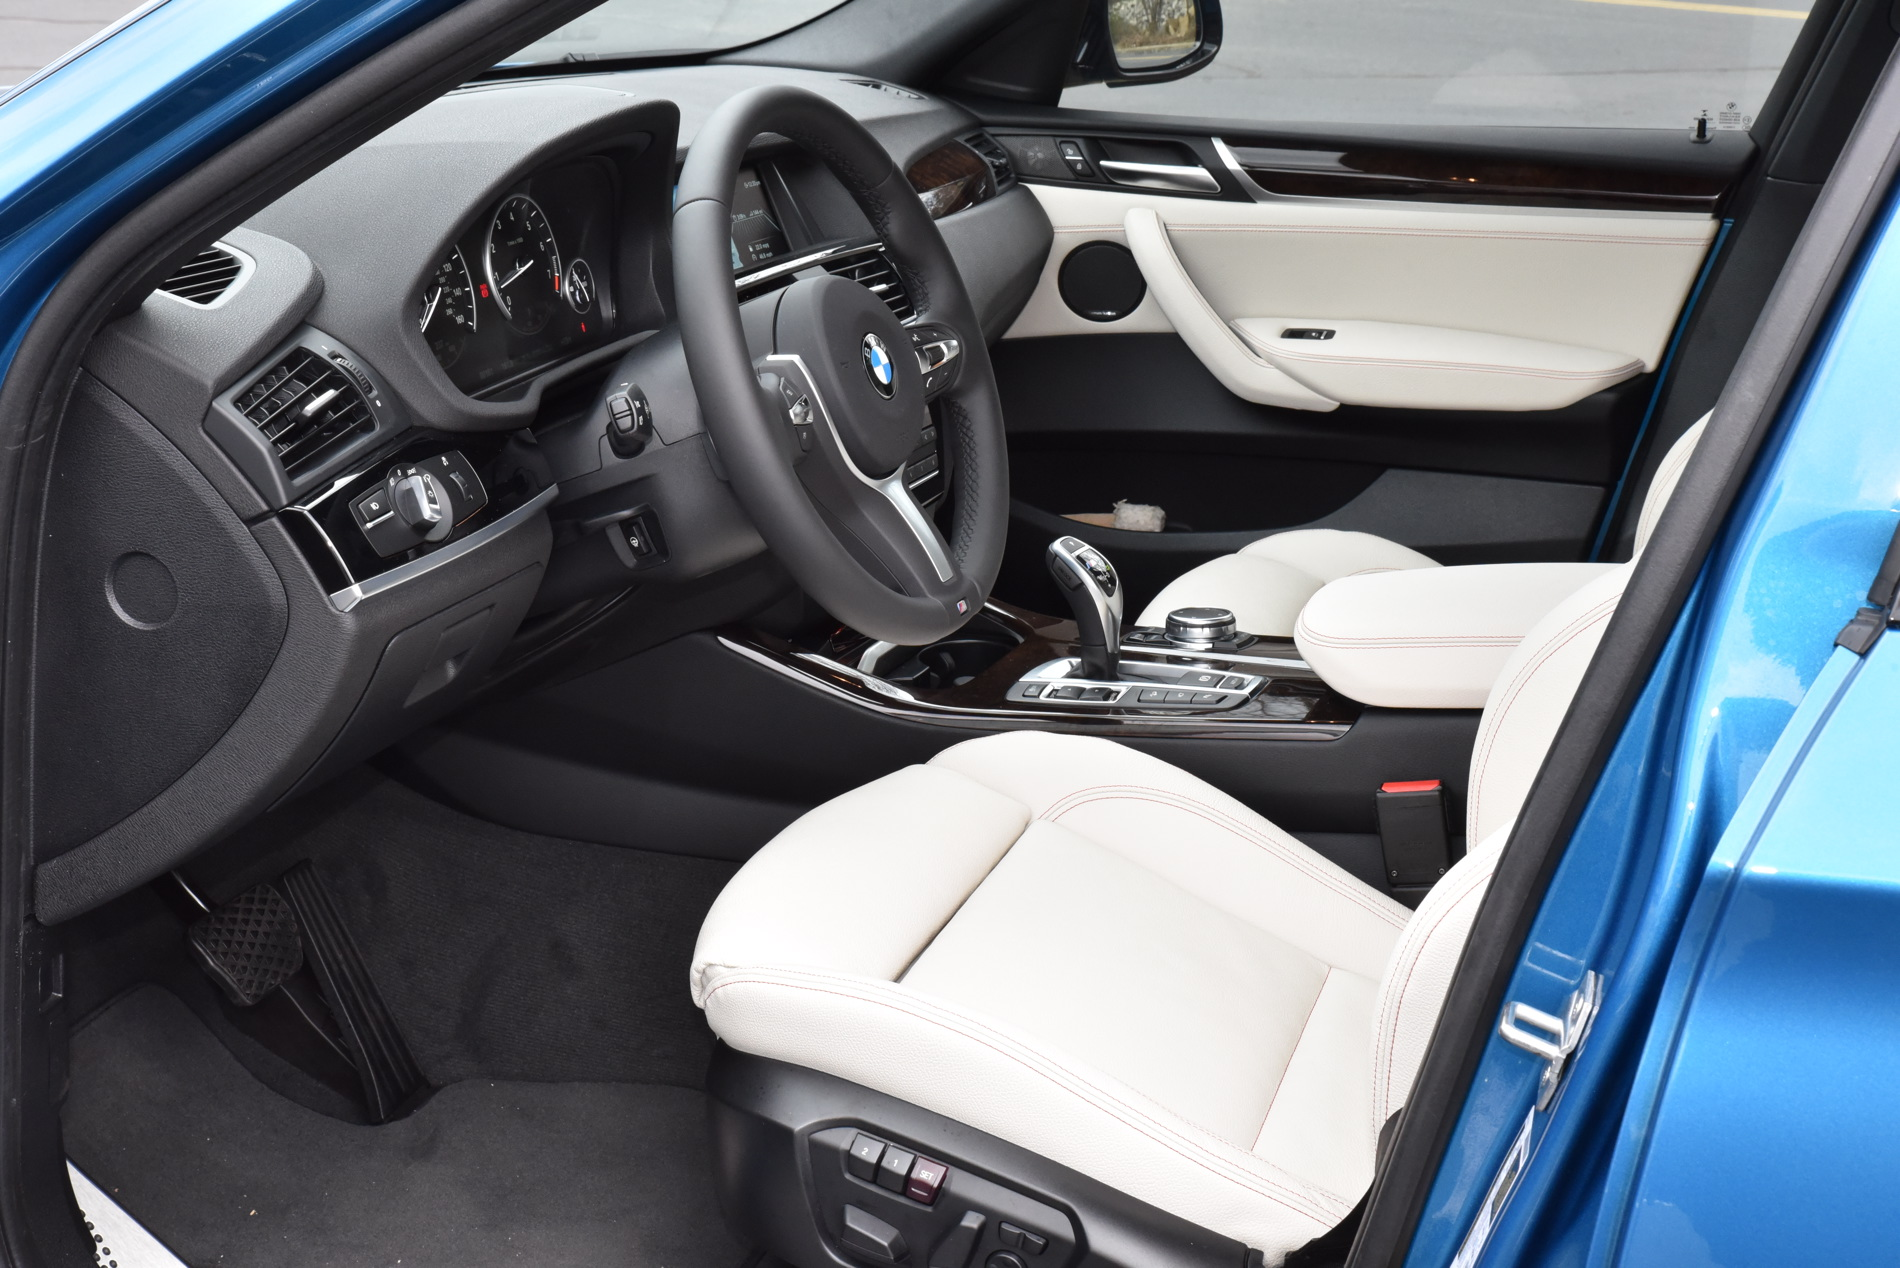 2016 BMW X4 M40i Long Beach Blue Drive 5 750x501